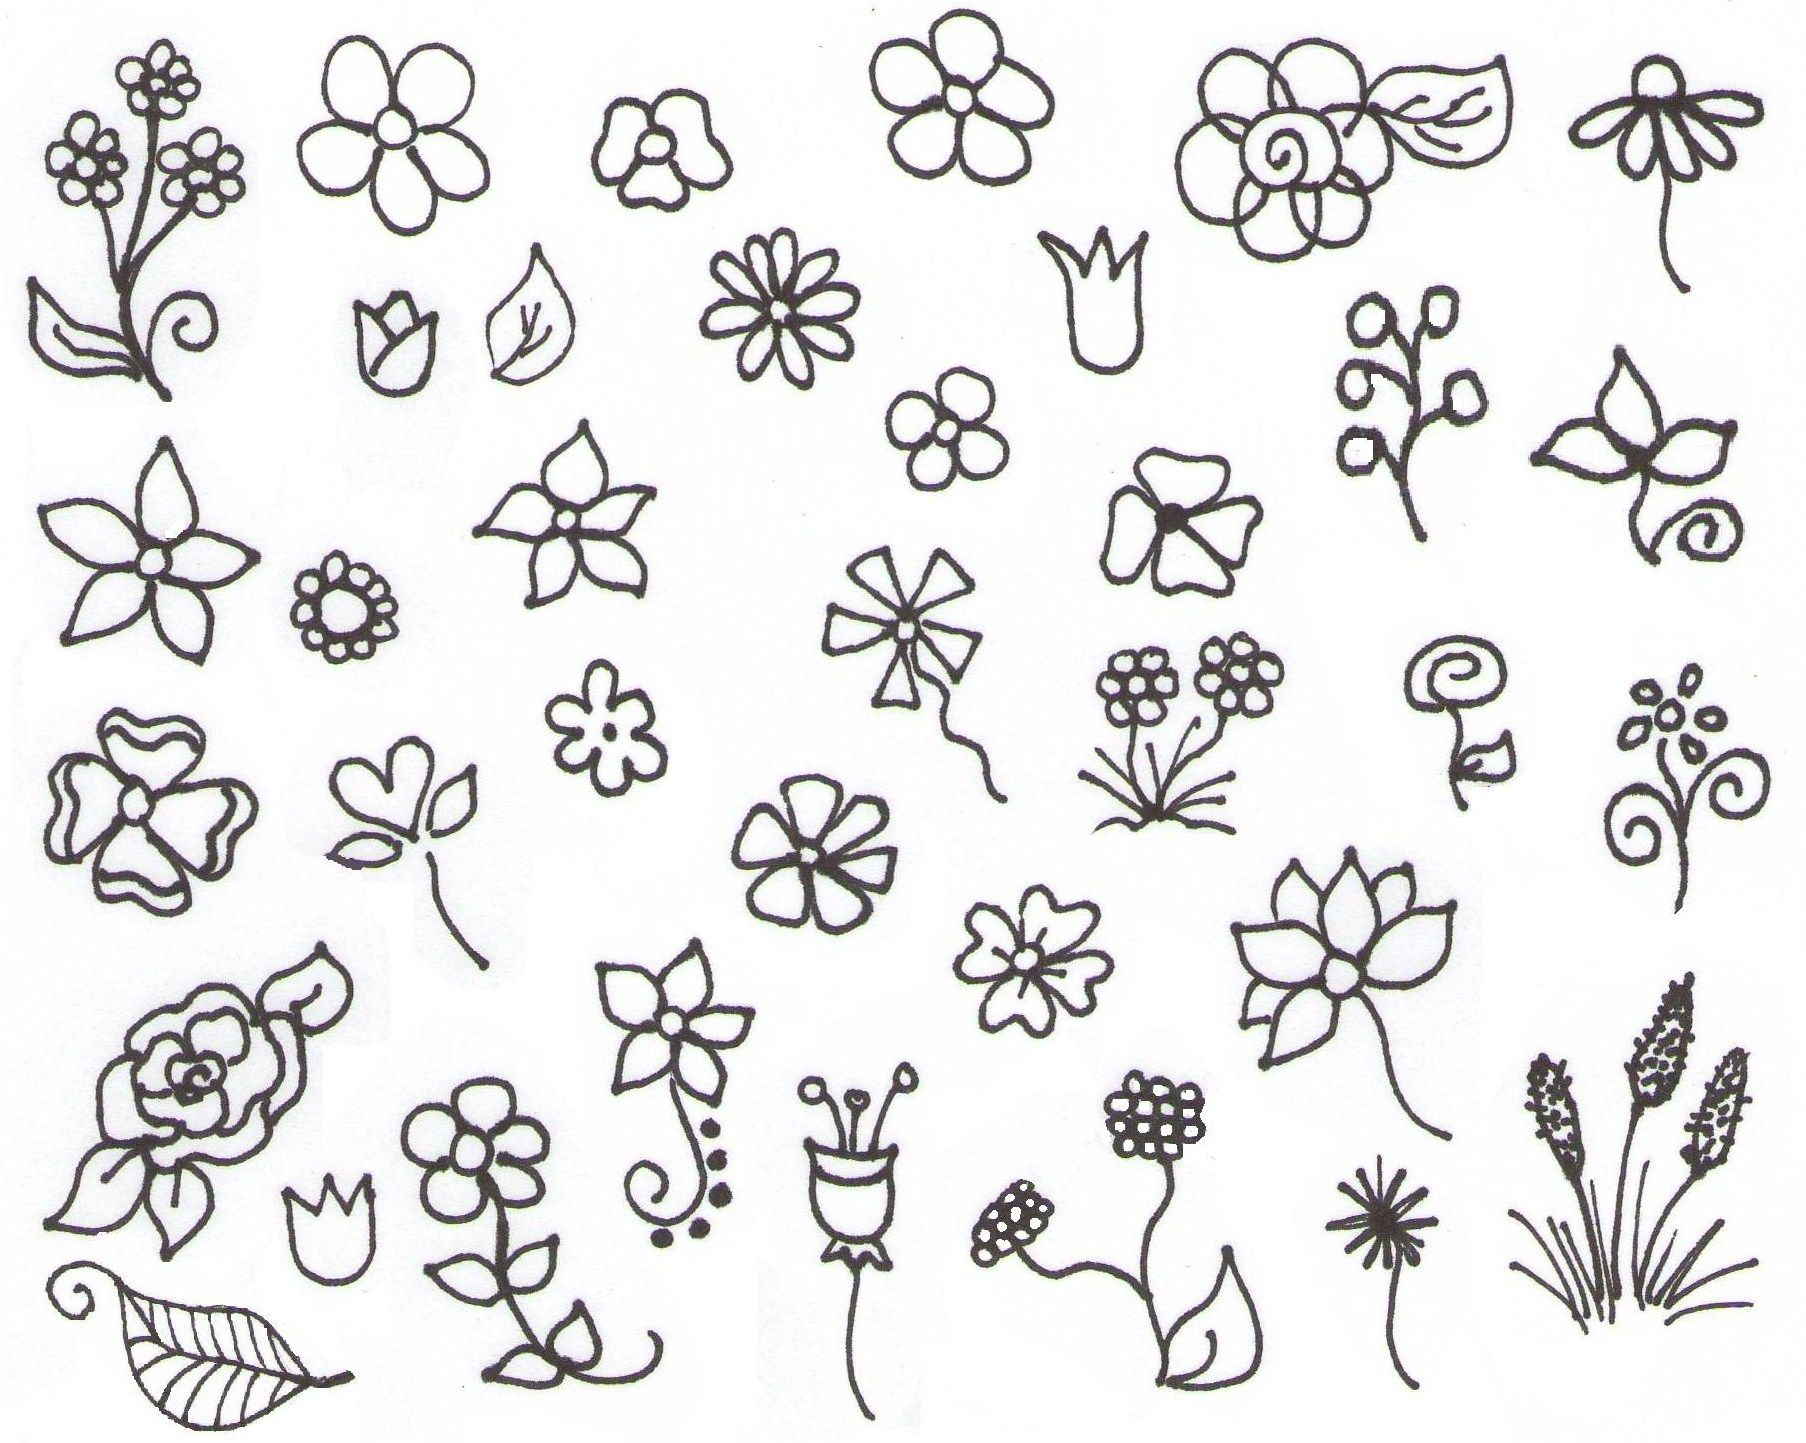 My Inspiration Flower Doodles